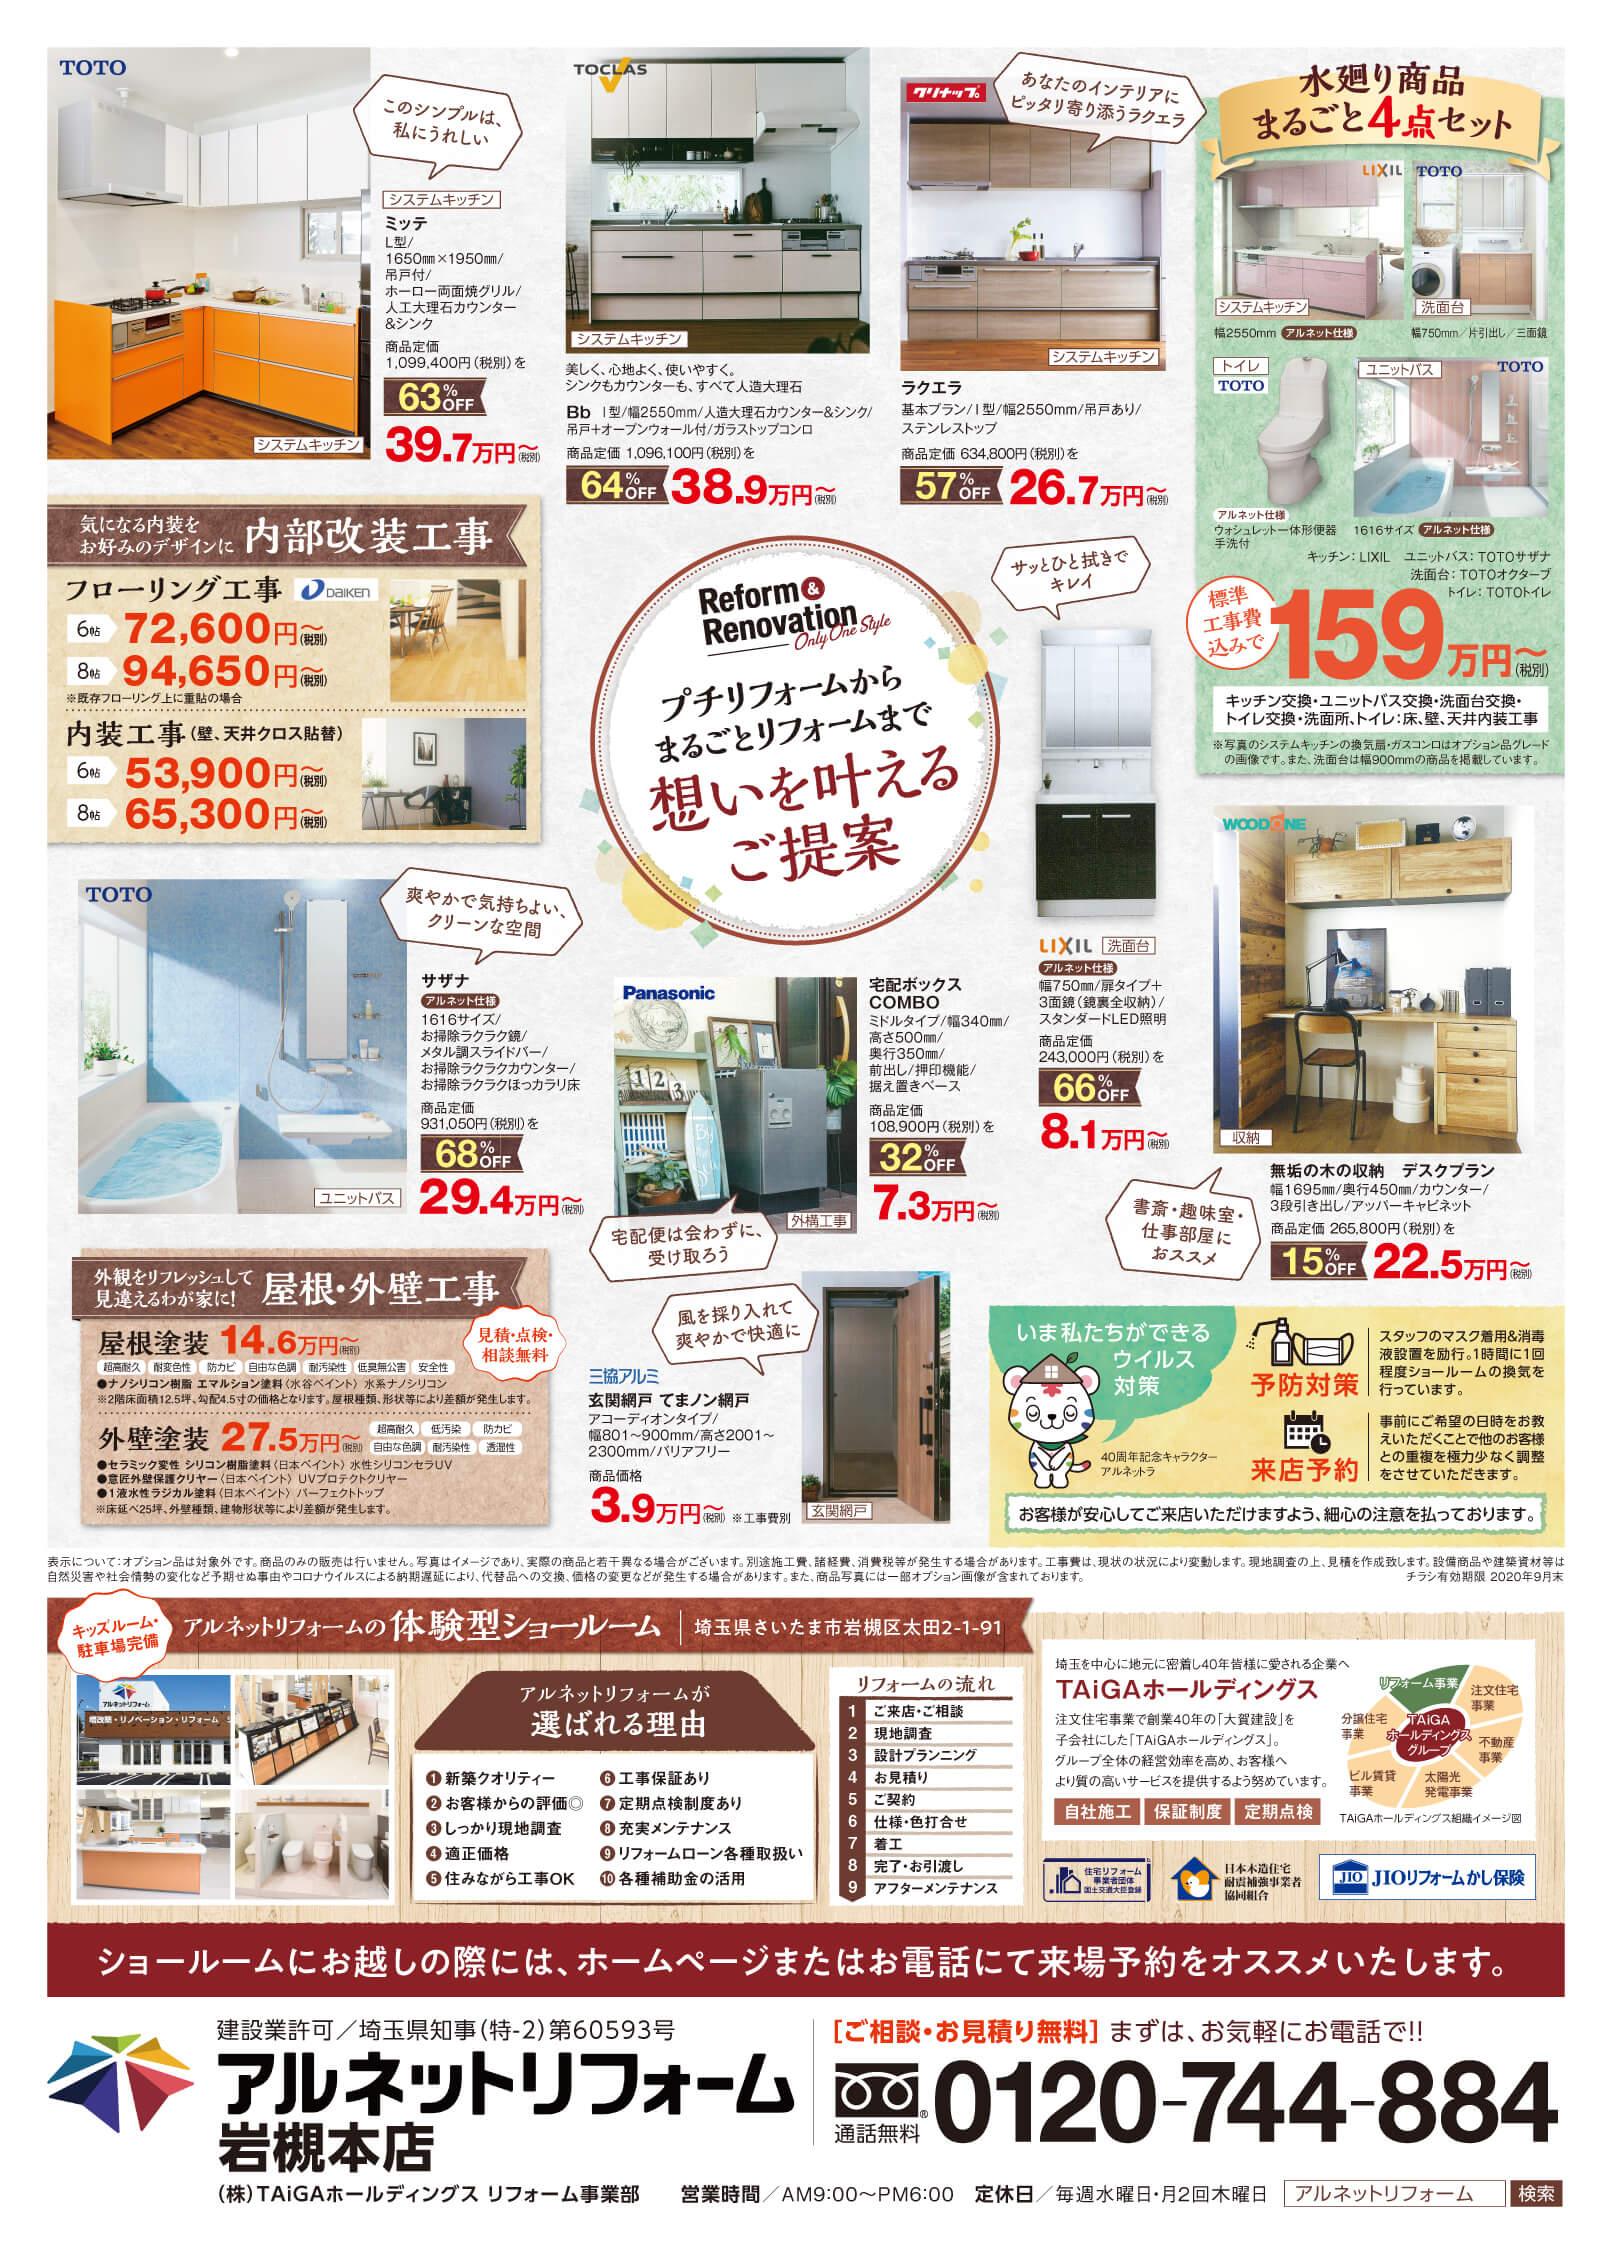 【岩槻本店&越谷西方店】9月イベント開催!